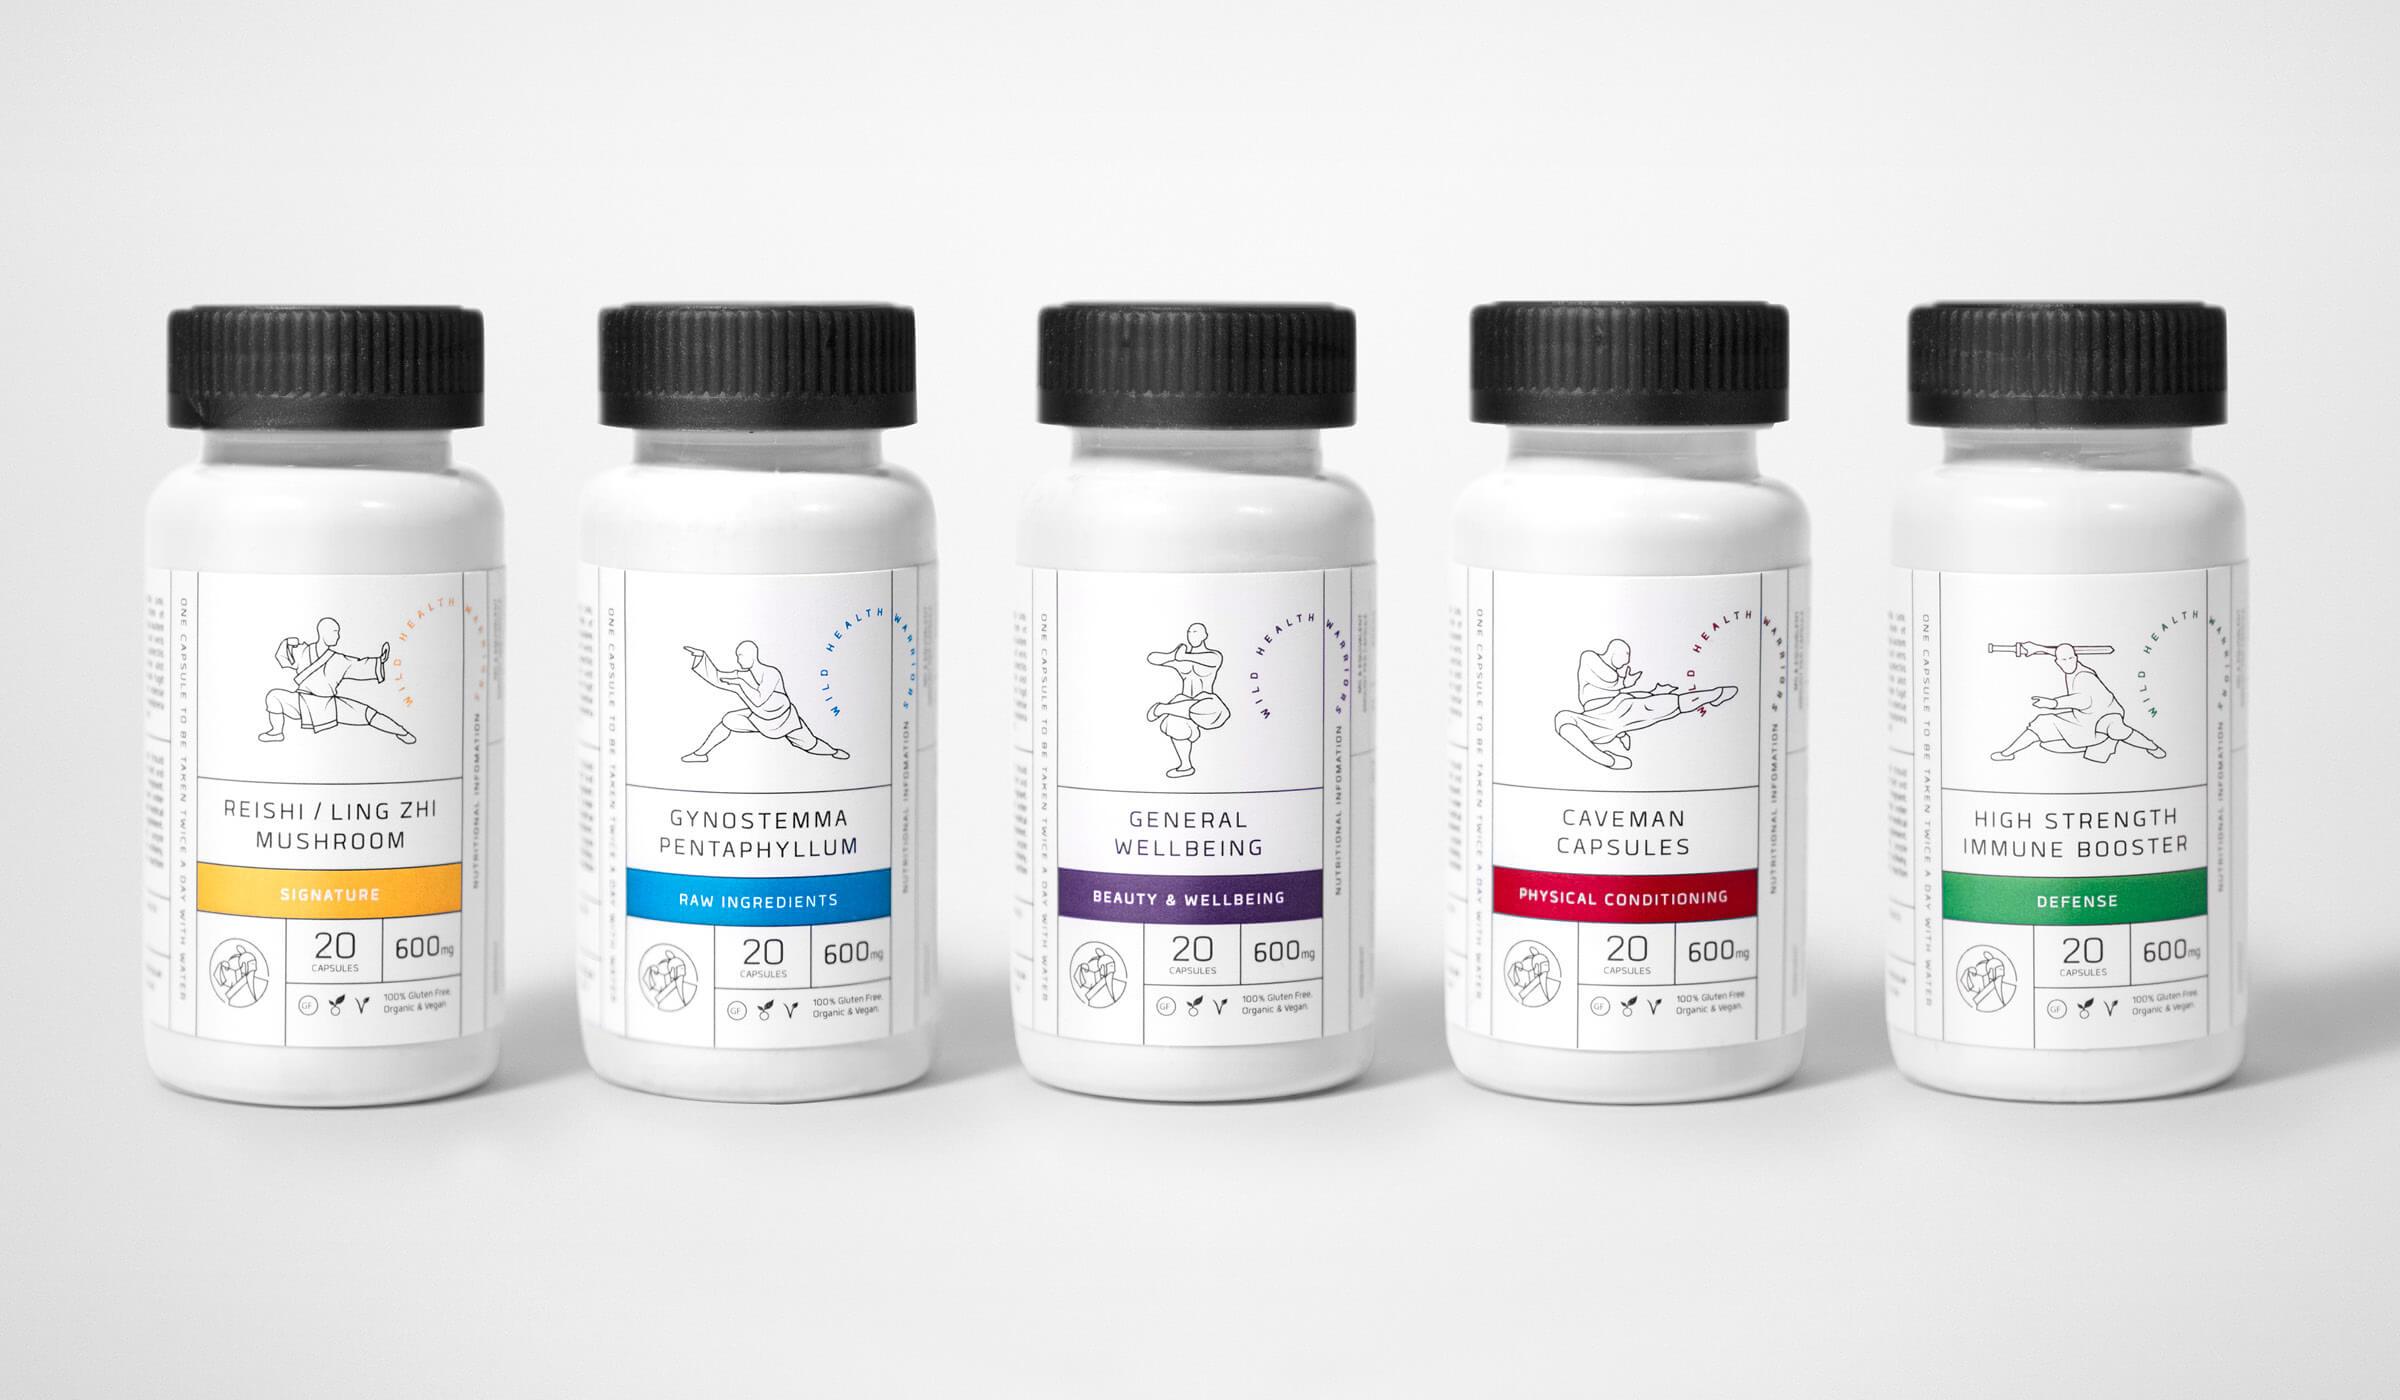 Health supplements bottle packaging design